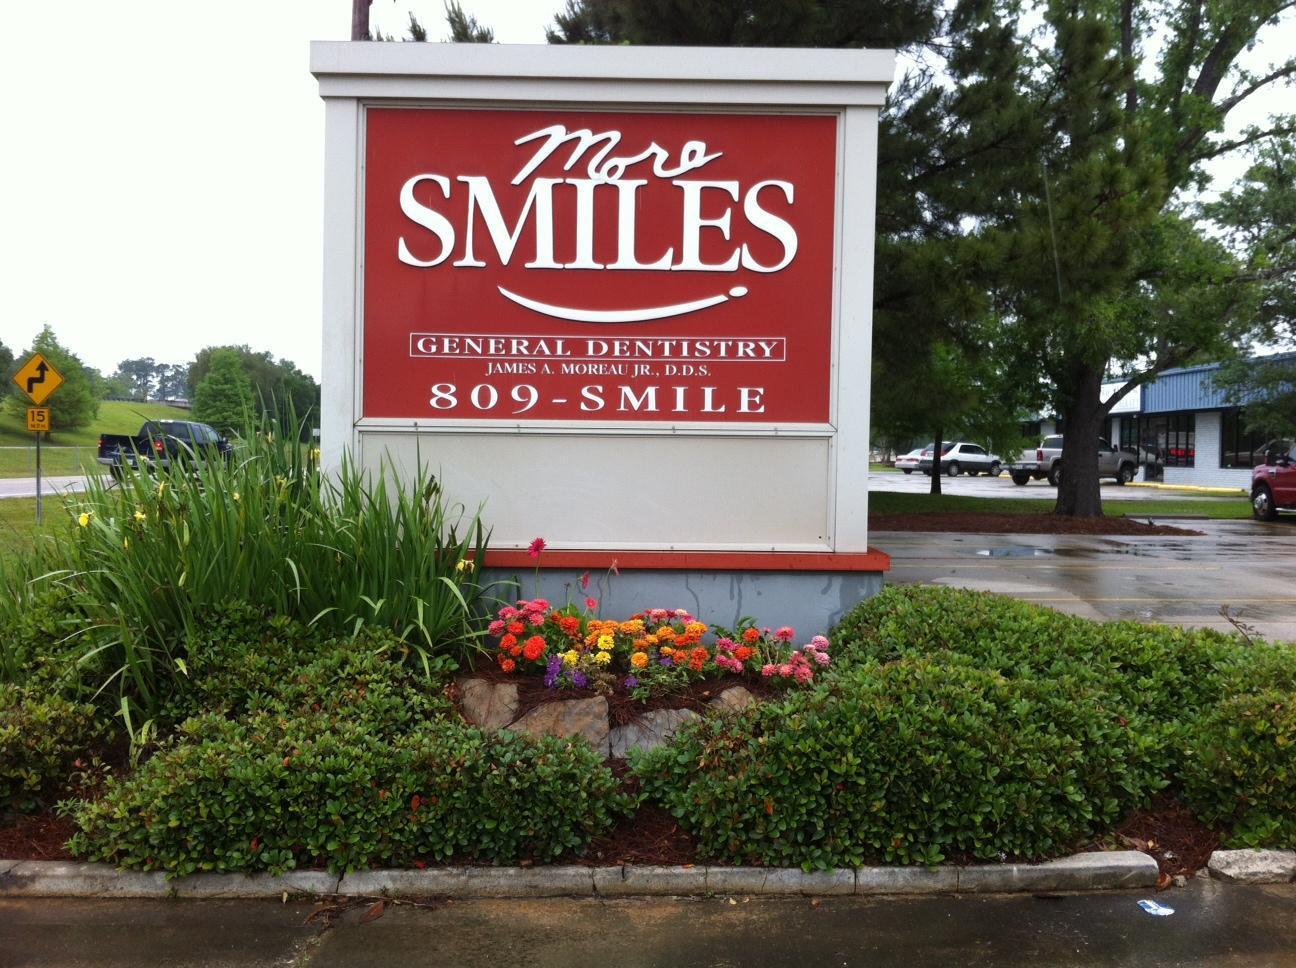 MoreSmiles Dental